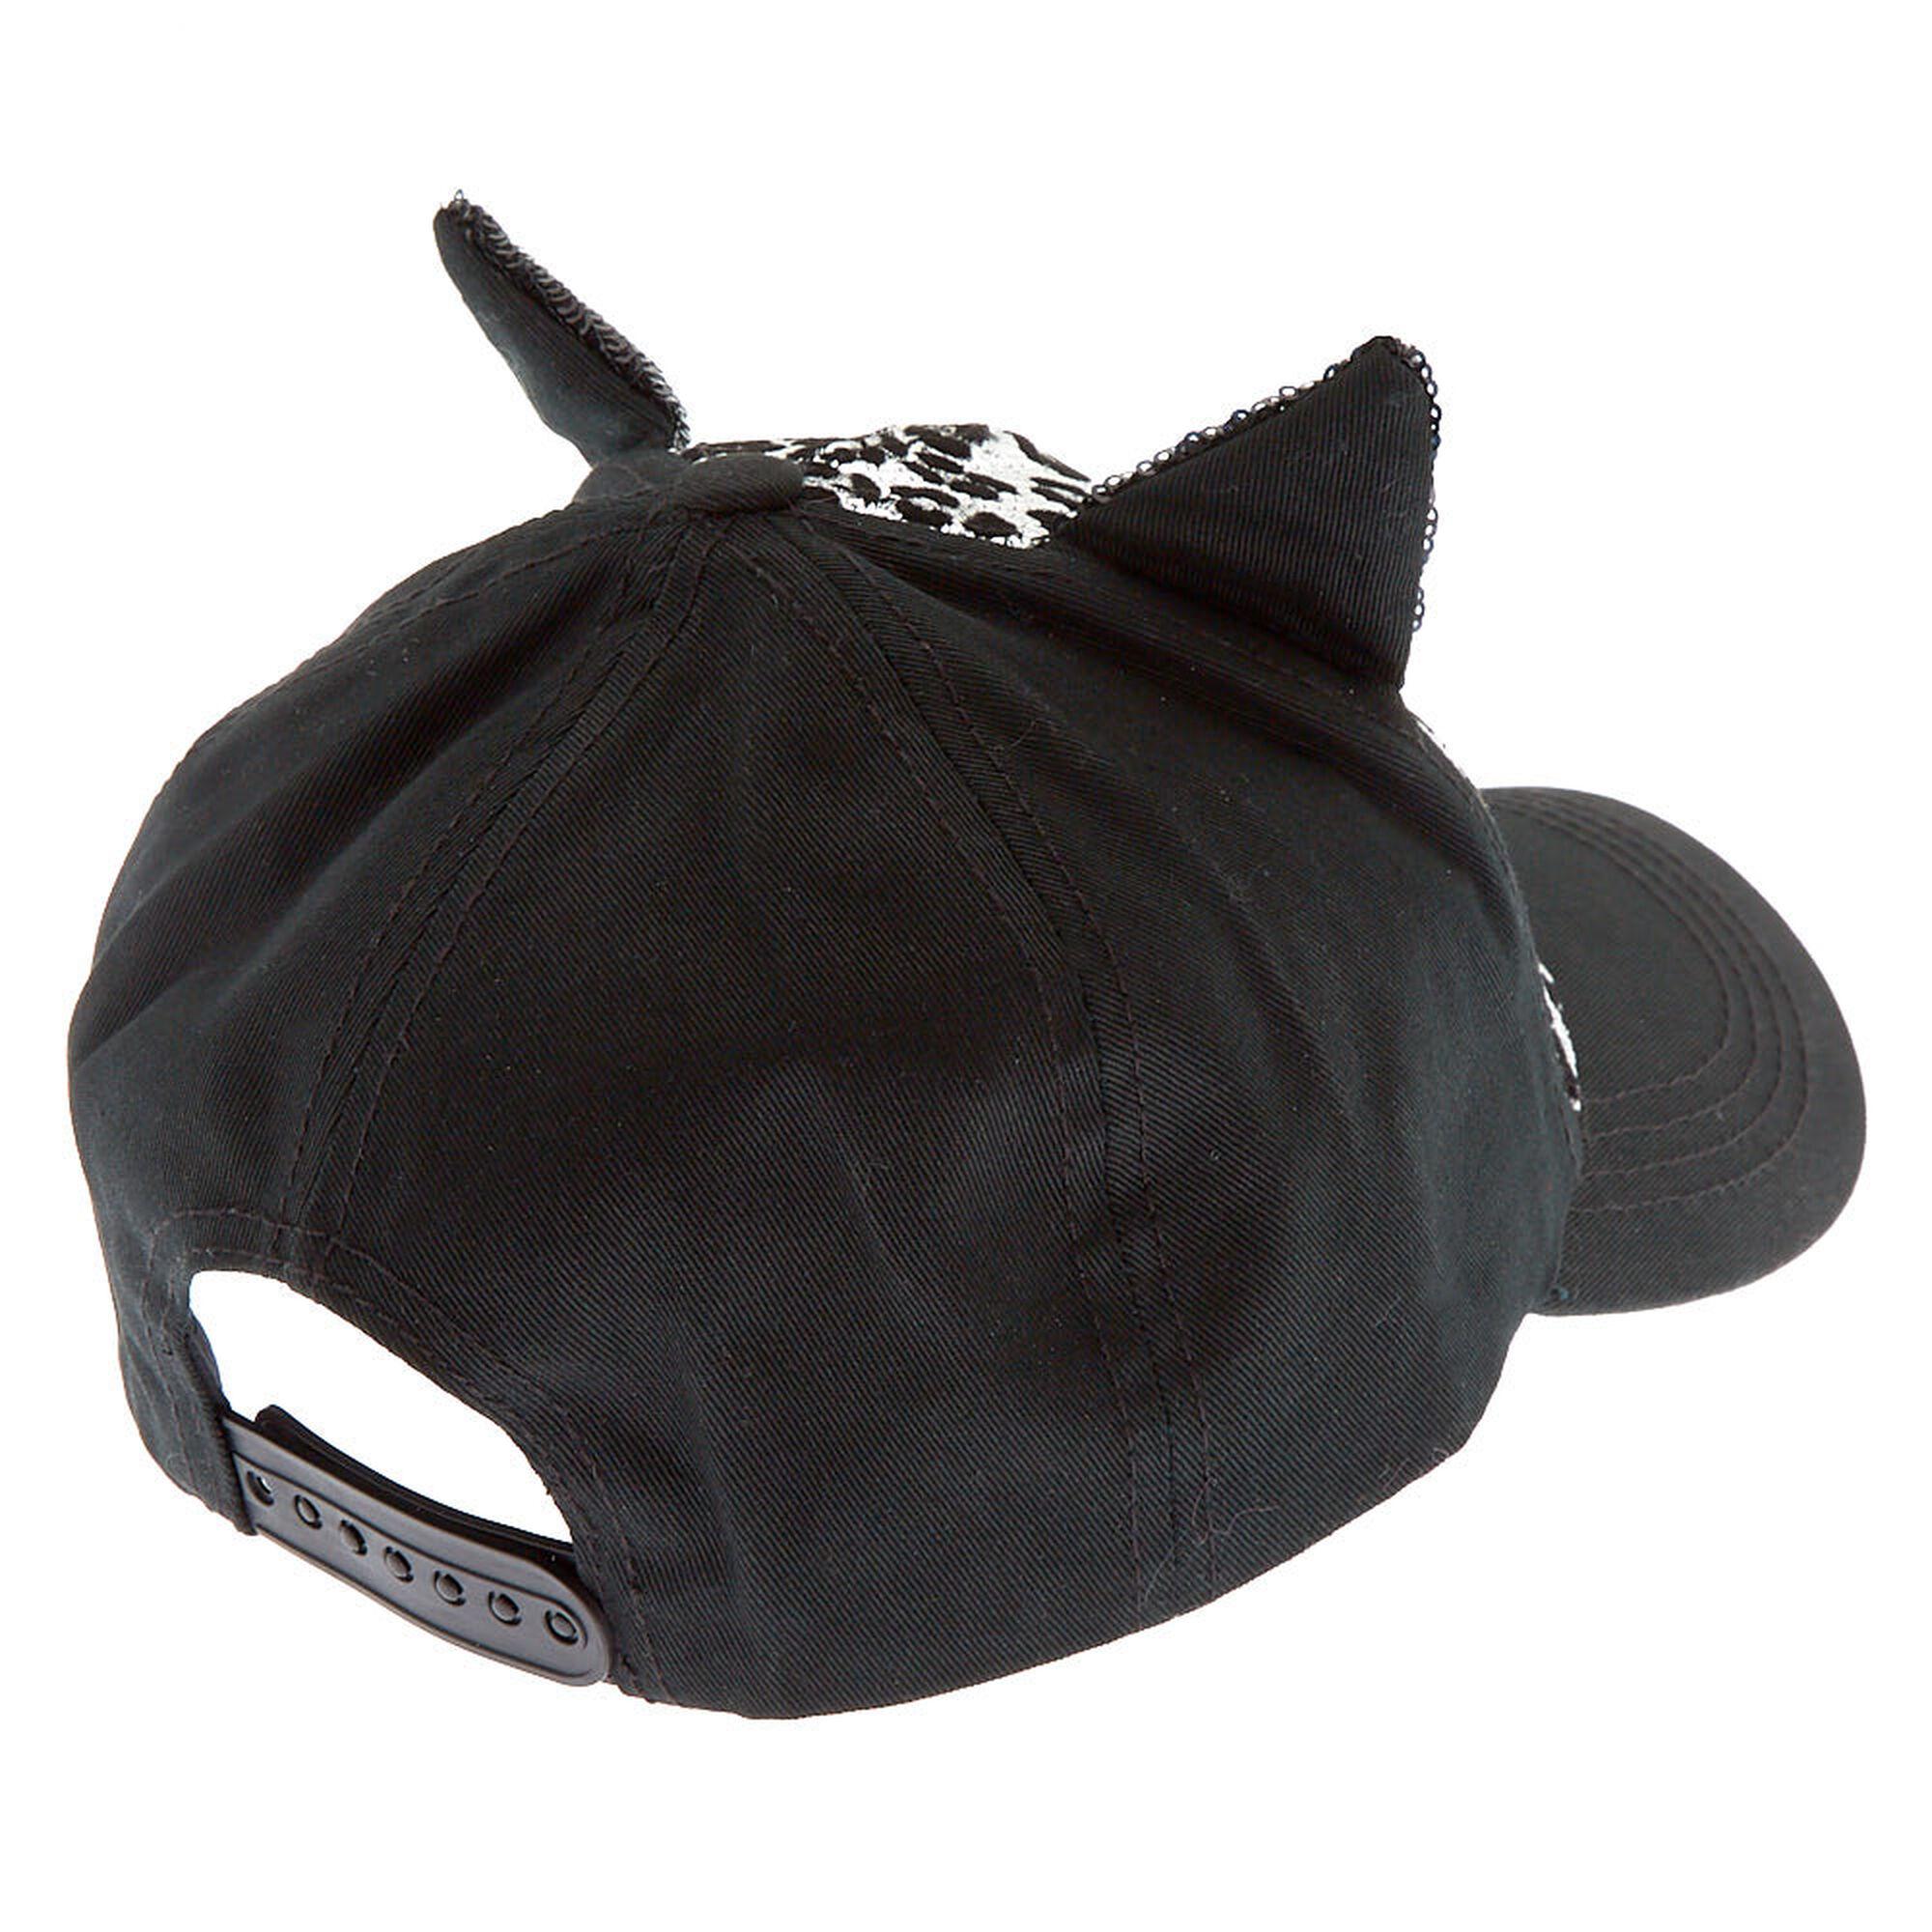 ed515035e Sequin Leopard Cat Ear Baseball Cap - Black